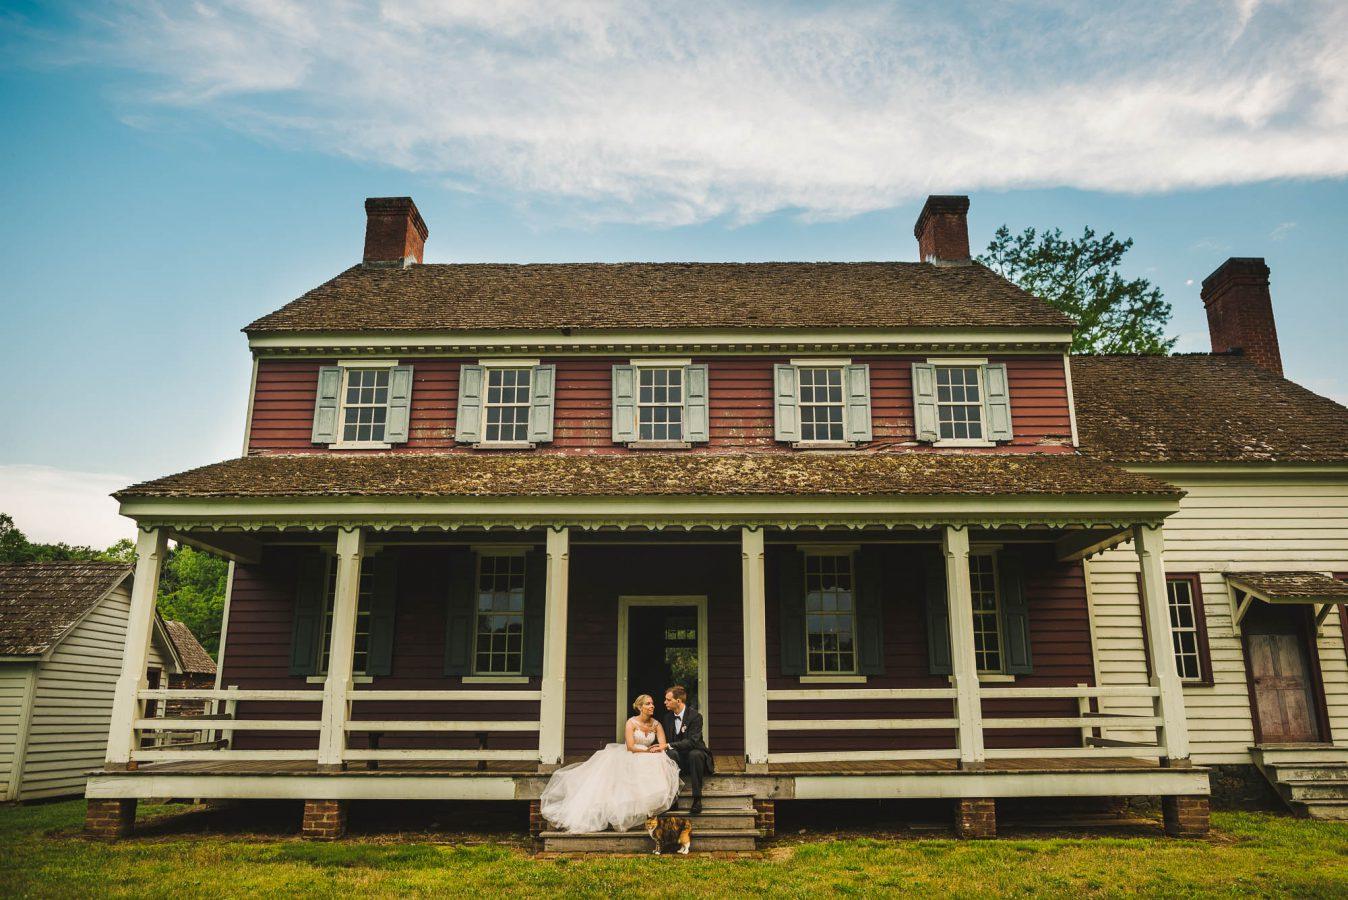 23-old-wedding-venues